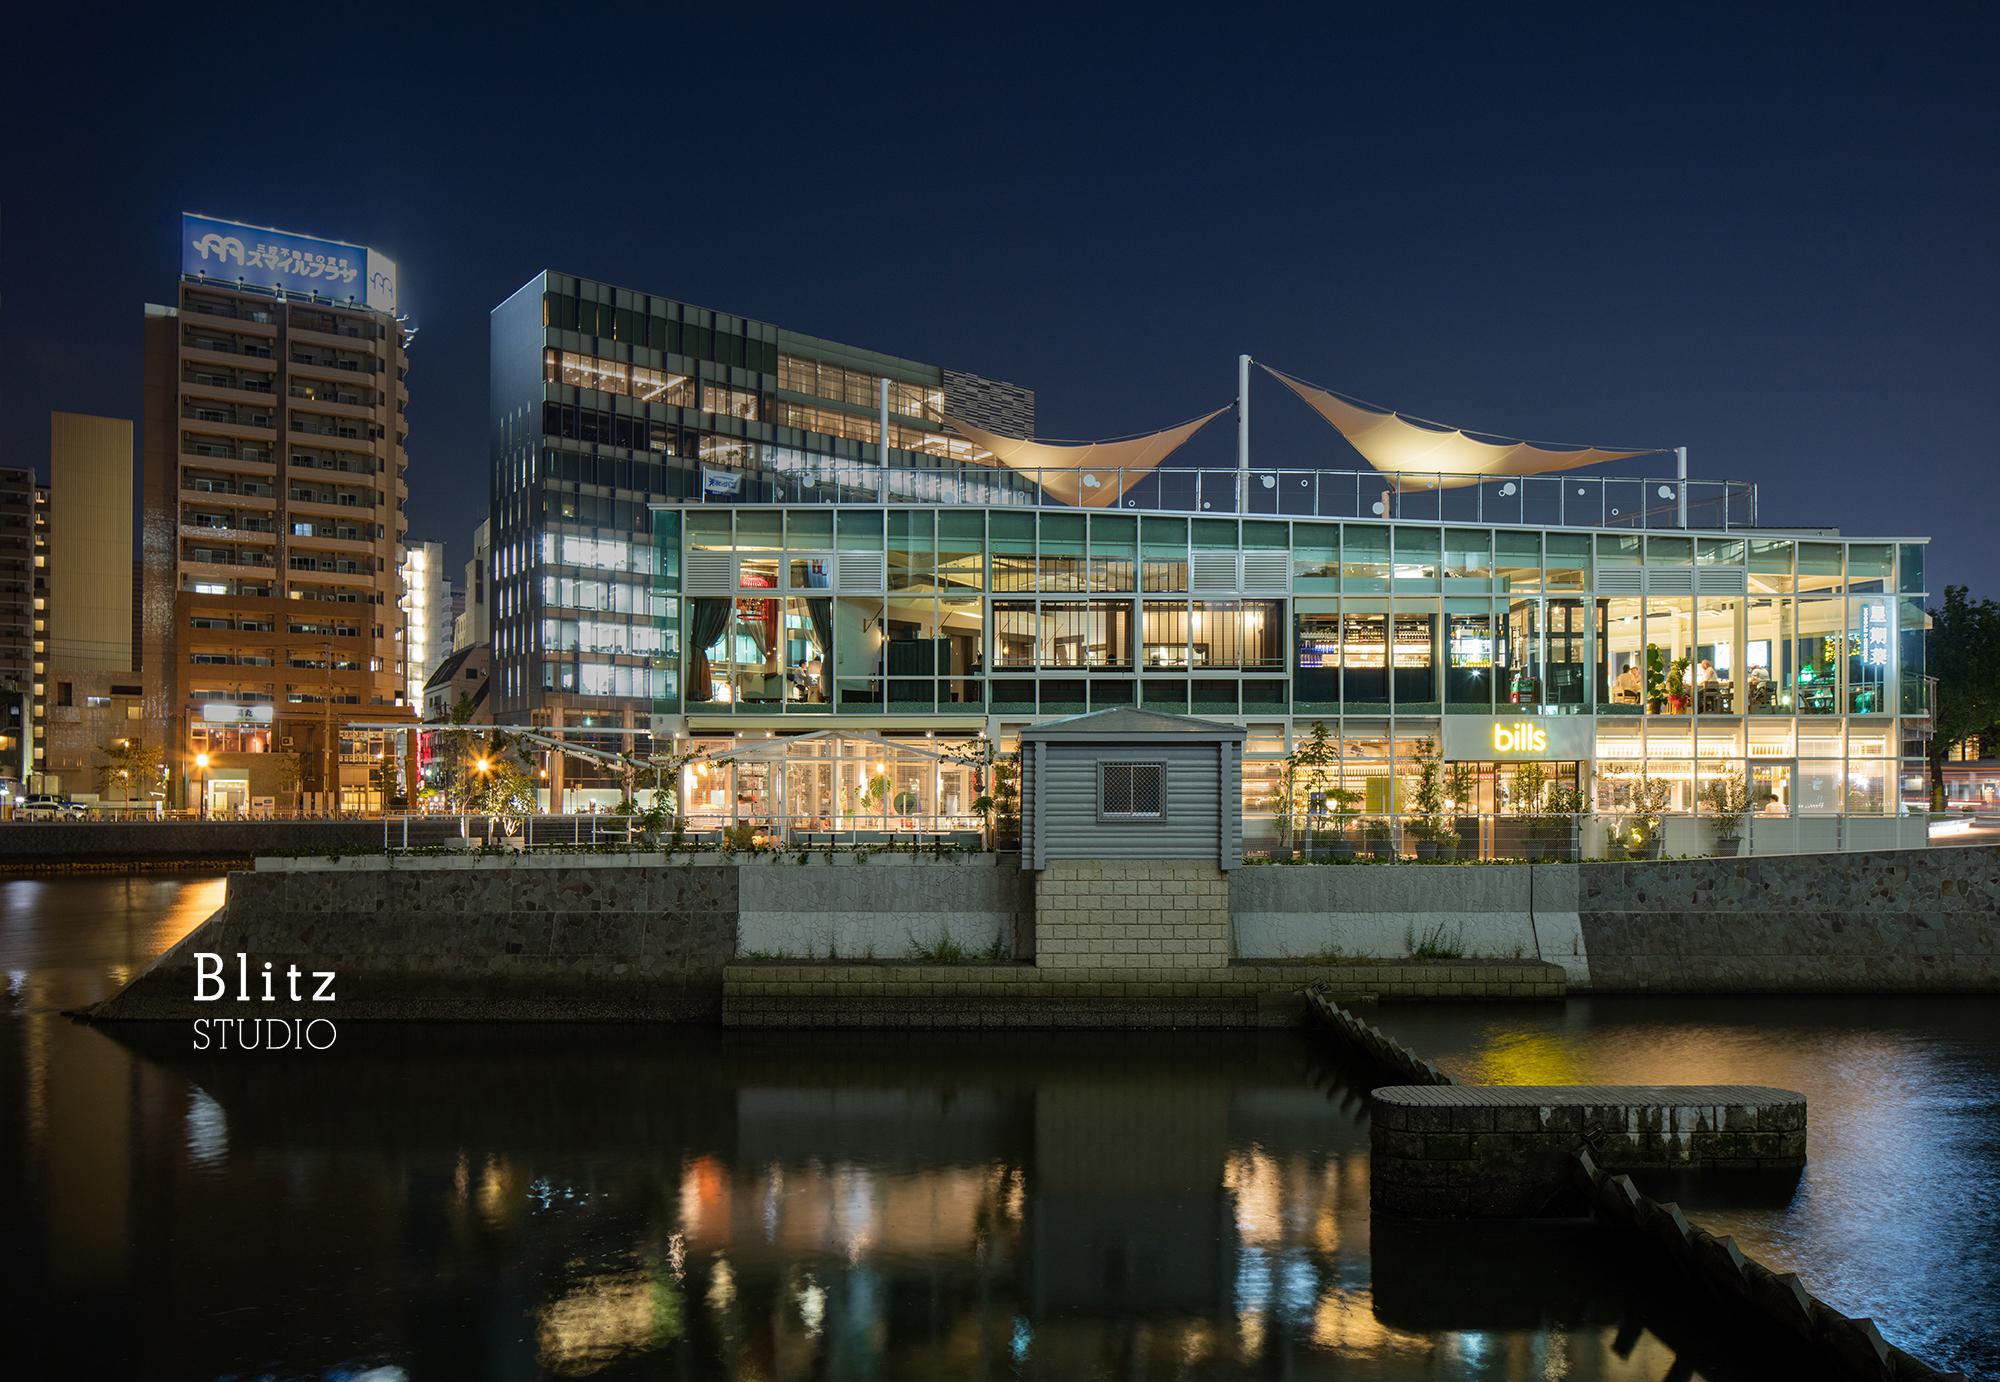 『星期菜 NOODLE & CHINOIS』-福岡県福岡市-建築写真・竣工写真・インテリア写真4